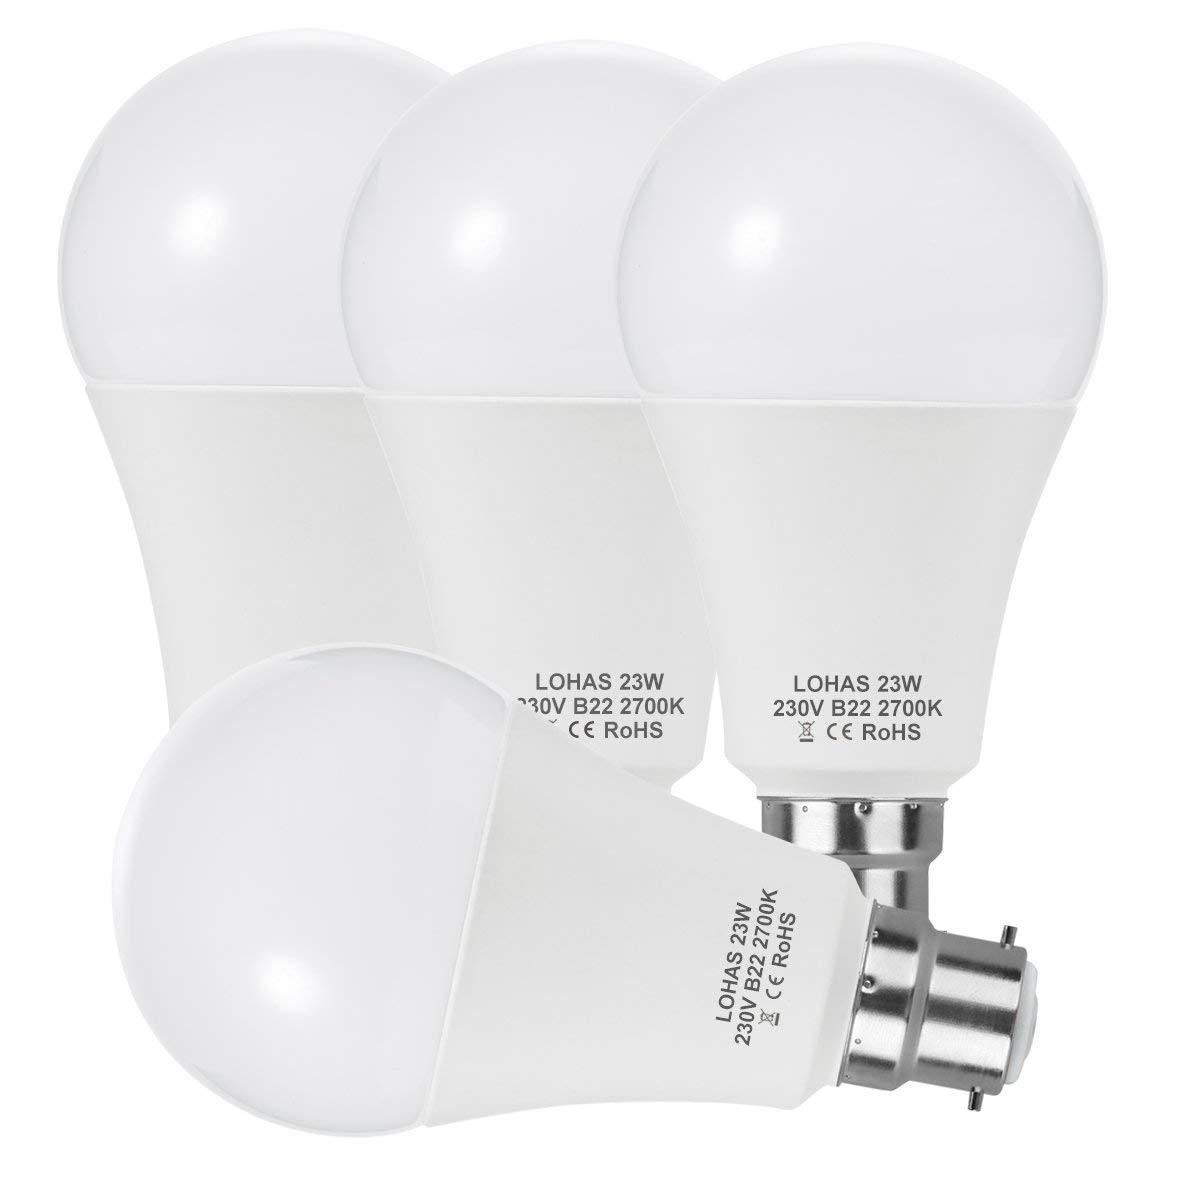 2x 9W LED Cool White Low Energy Pearl GLS Globe Light Bulb BC B22 Lamp